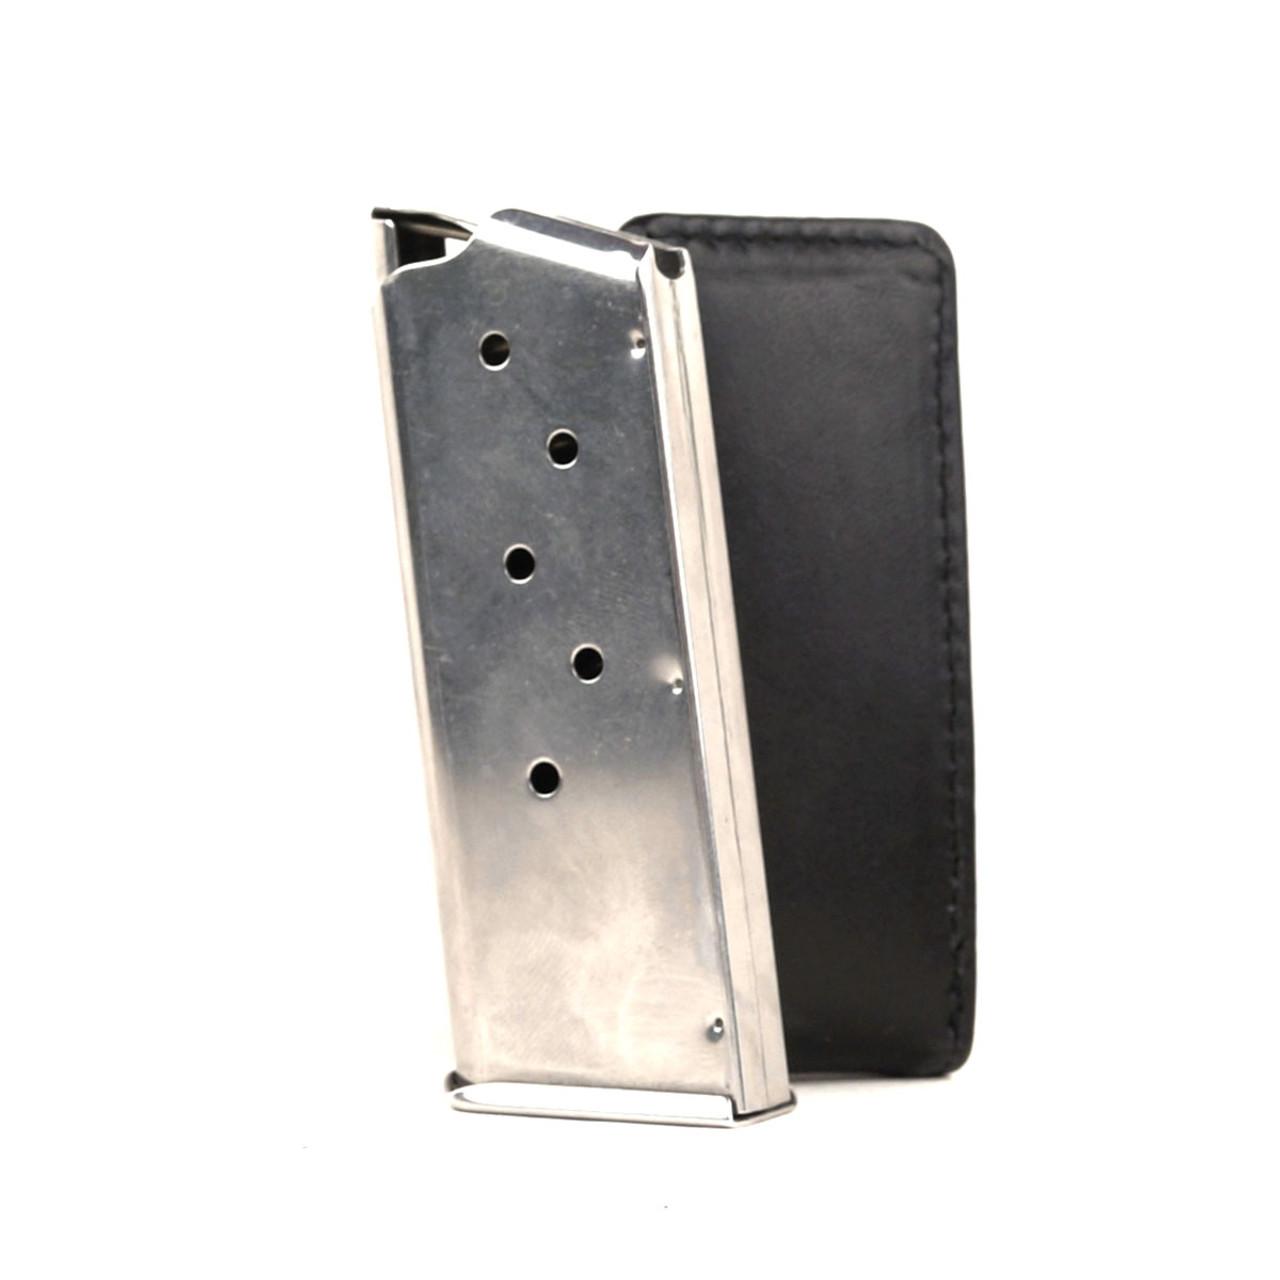 Rohrbaugh 9mm Magazine Pocket Protector